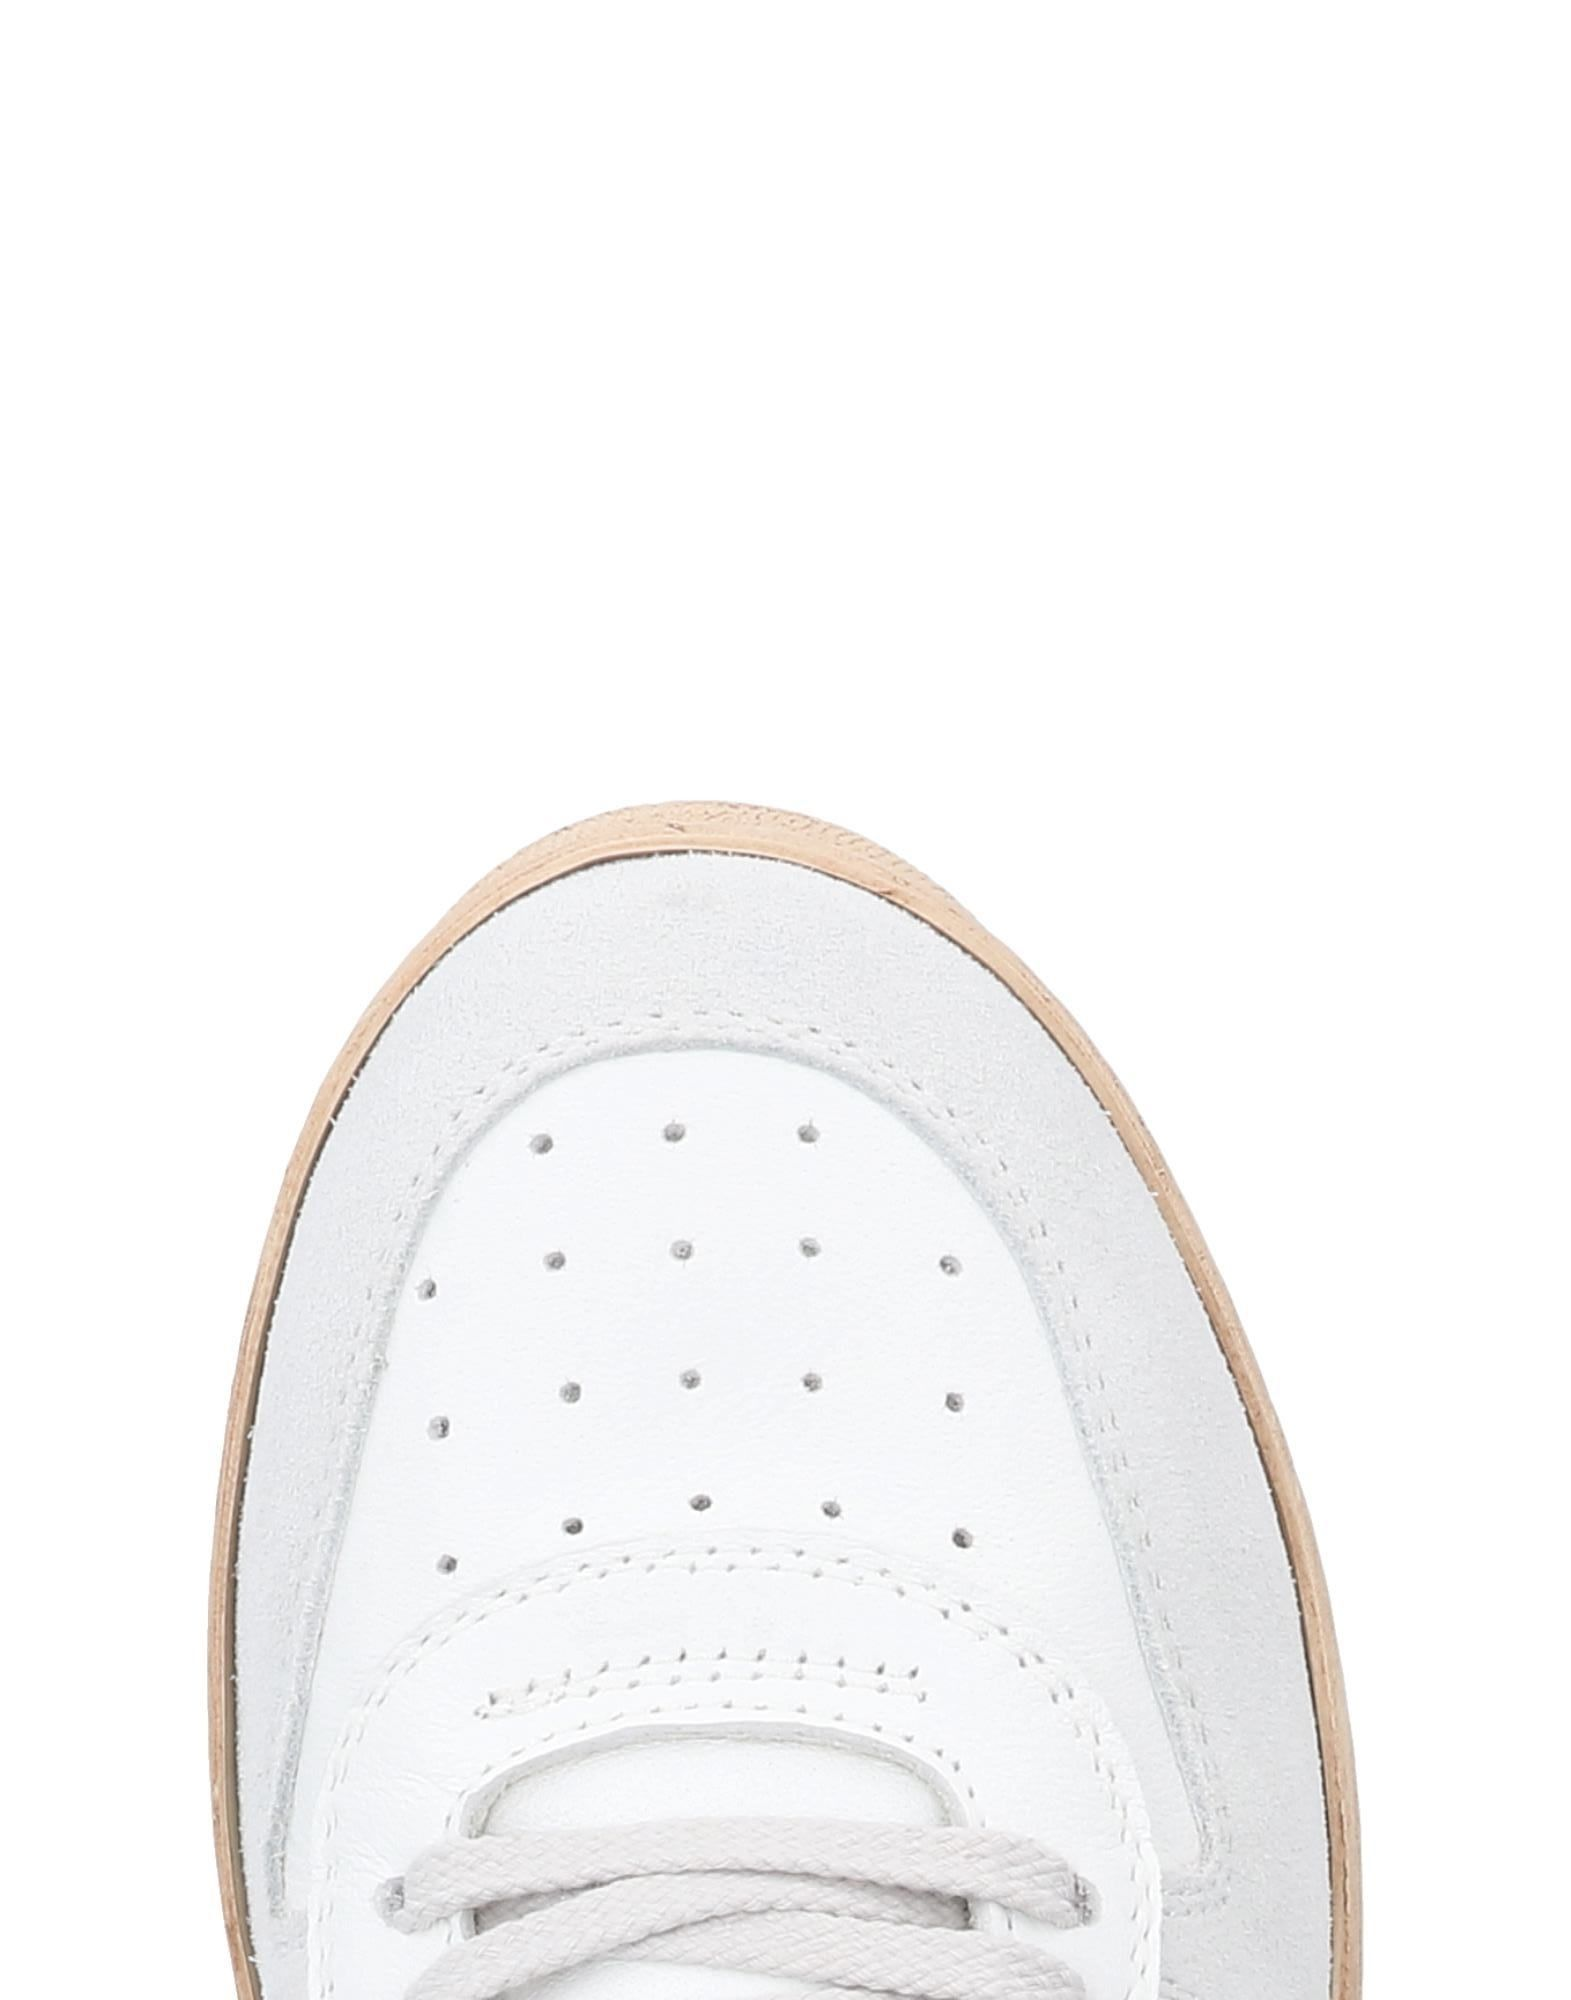 Valsport Sneakers - Women Valsport Sneakers online on    United Kingdom - 11465829KQ 038c91